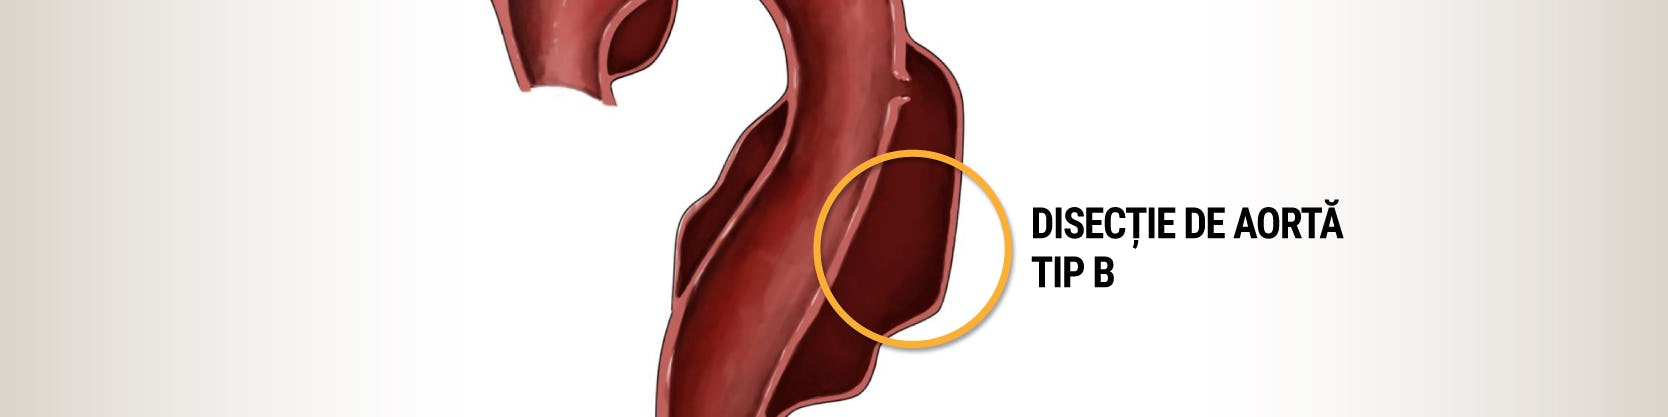 Implantare de stent graft - Disecție de aortă de tip B | Tratament minim invaziv | Centrele Ares